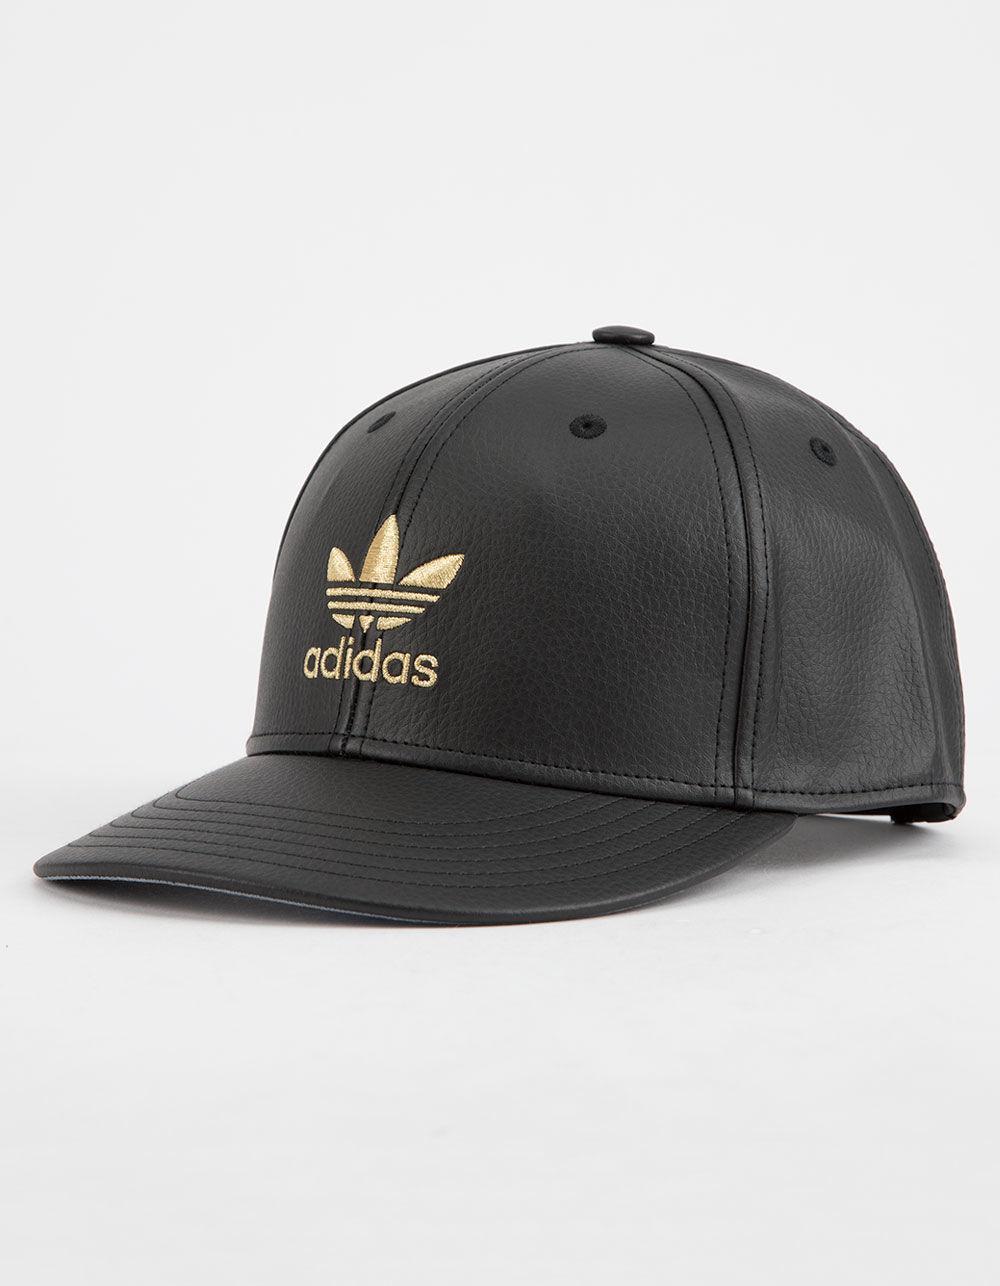 8d0ade78 adidas Original Trefoil Mens Faux Leather Snapback Hat in Black for ...